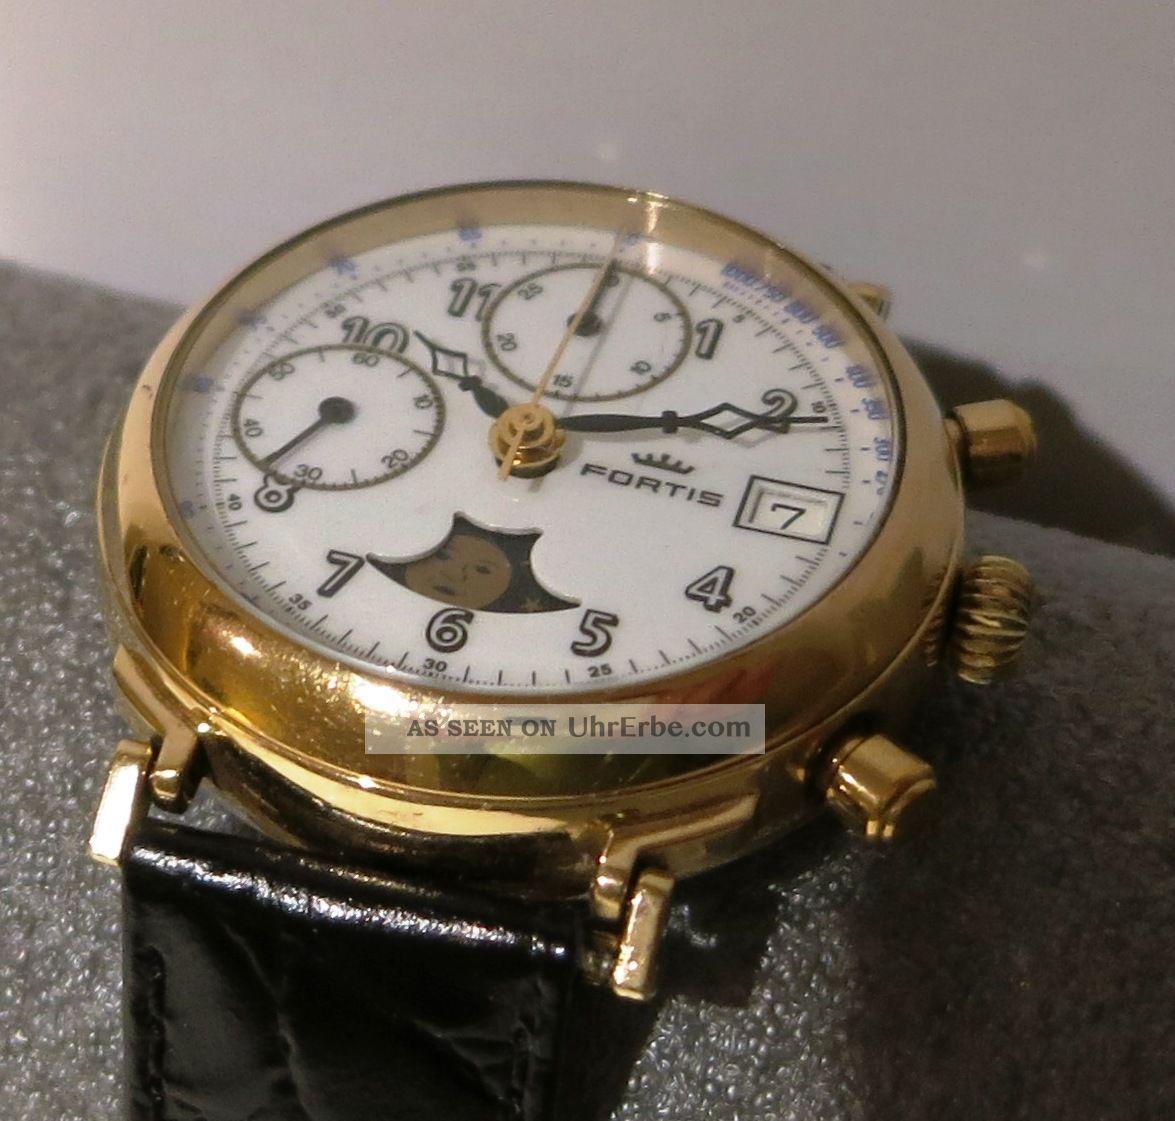 Fortis Chronograph Valjoux 7768 Mondphase